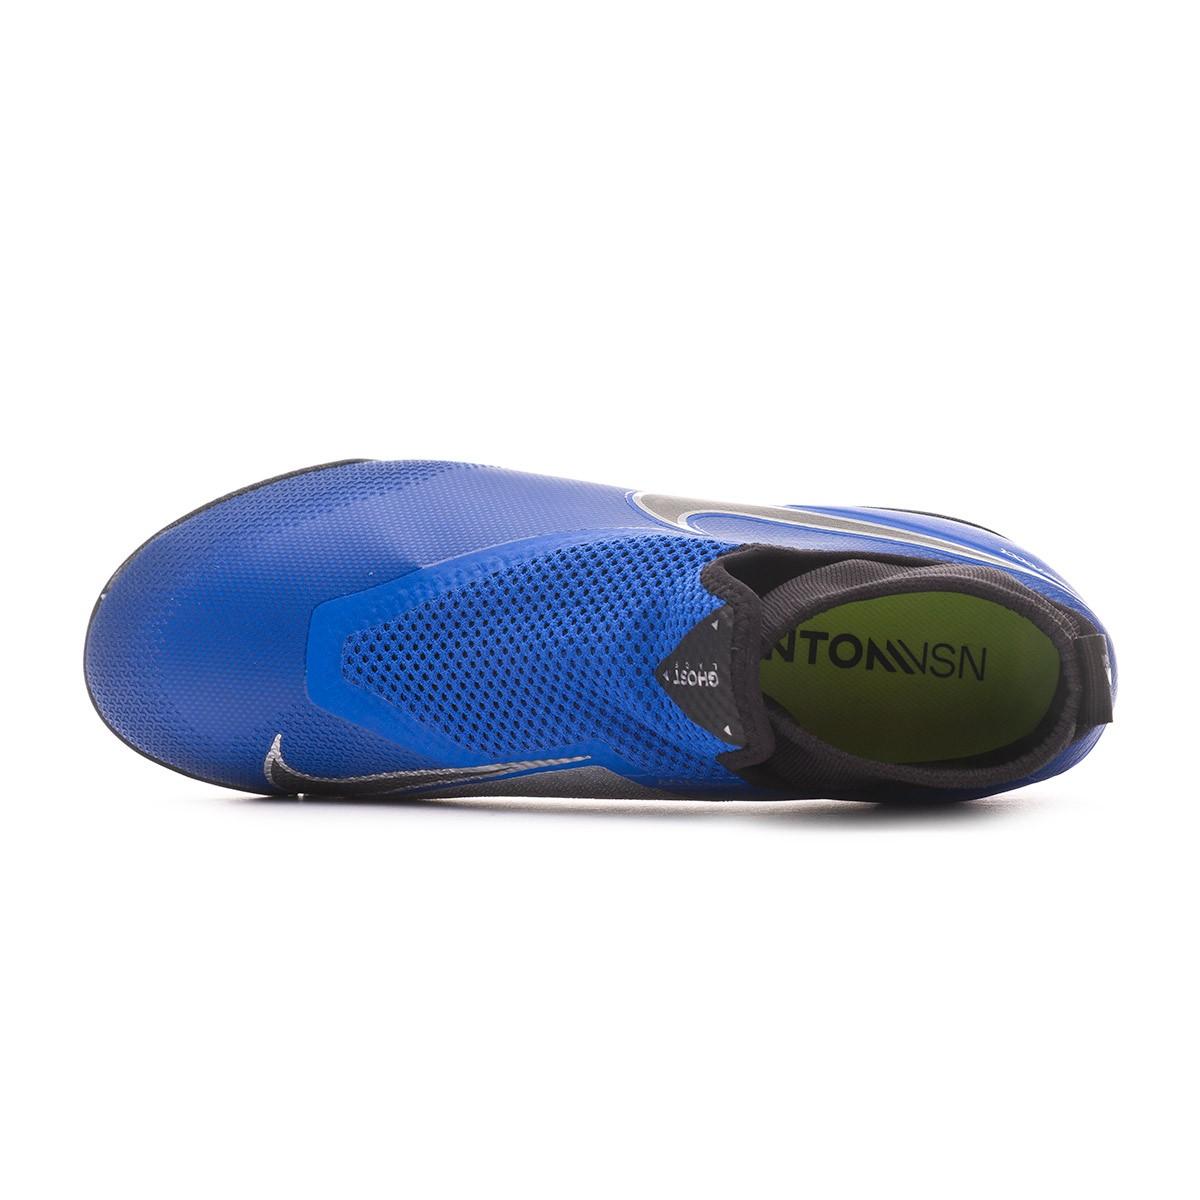 b0652544ae4f Football Boot Nike React Phantom Vision Pro DF Turf Racer  blue-Black-Metallic silver-Volt - Tienda de fútbol Fútbol Emotion